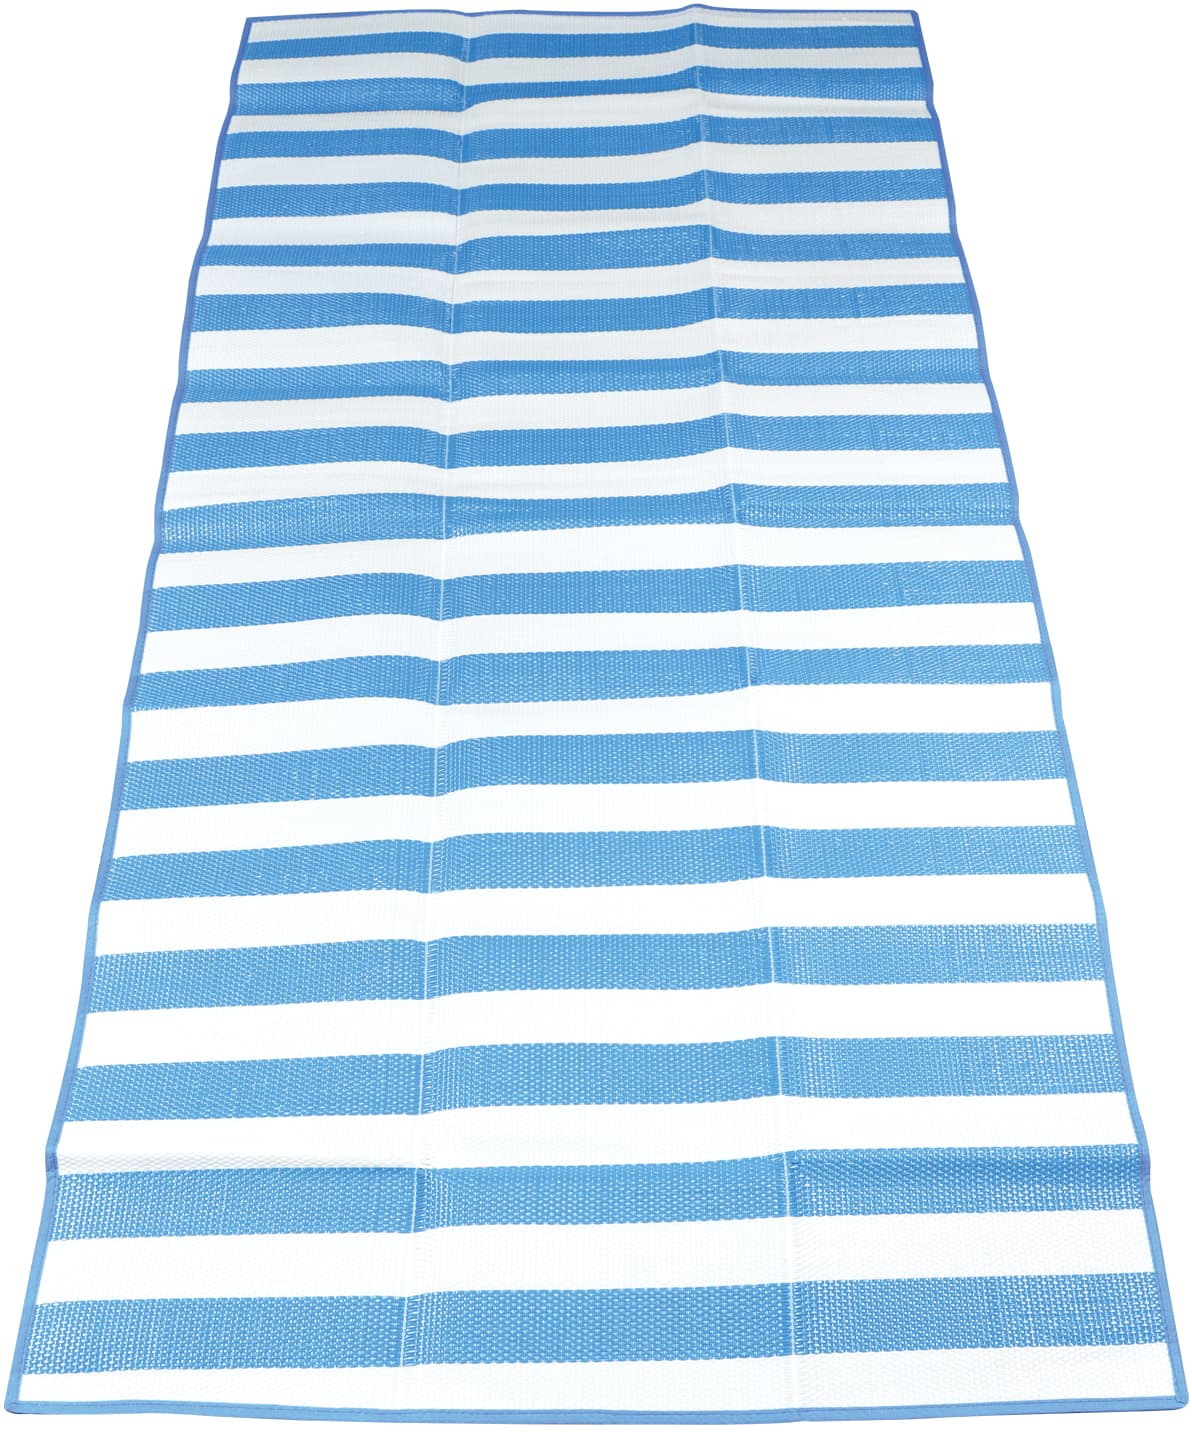 Panama Leisure / Beach Mat